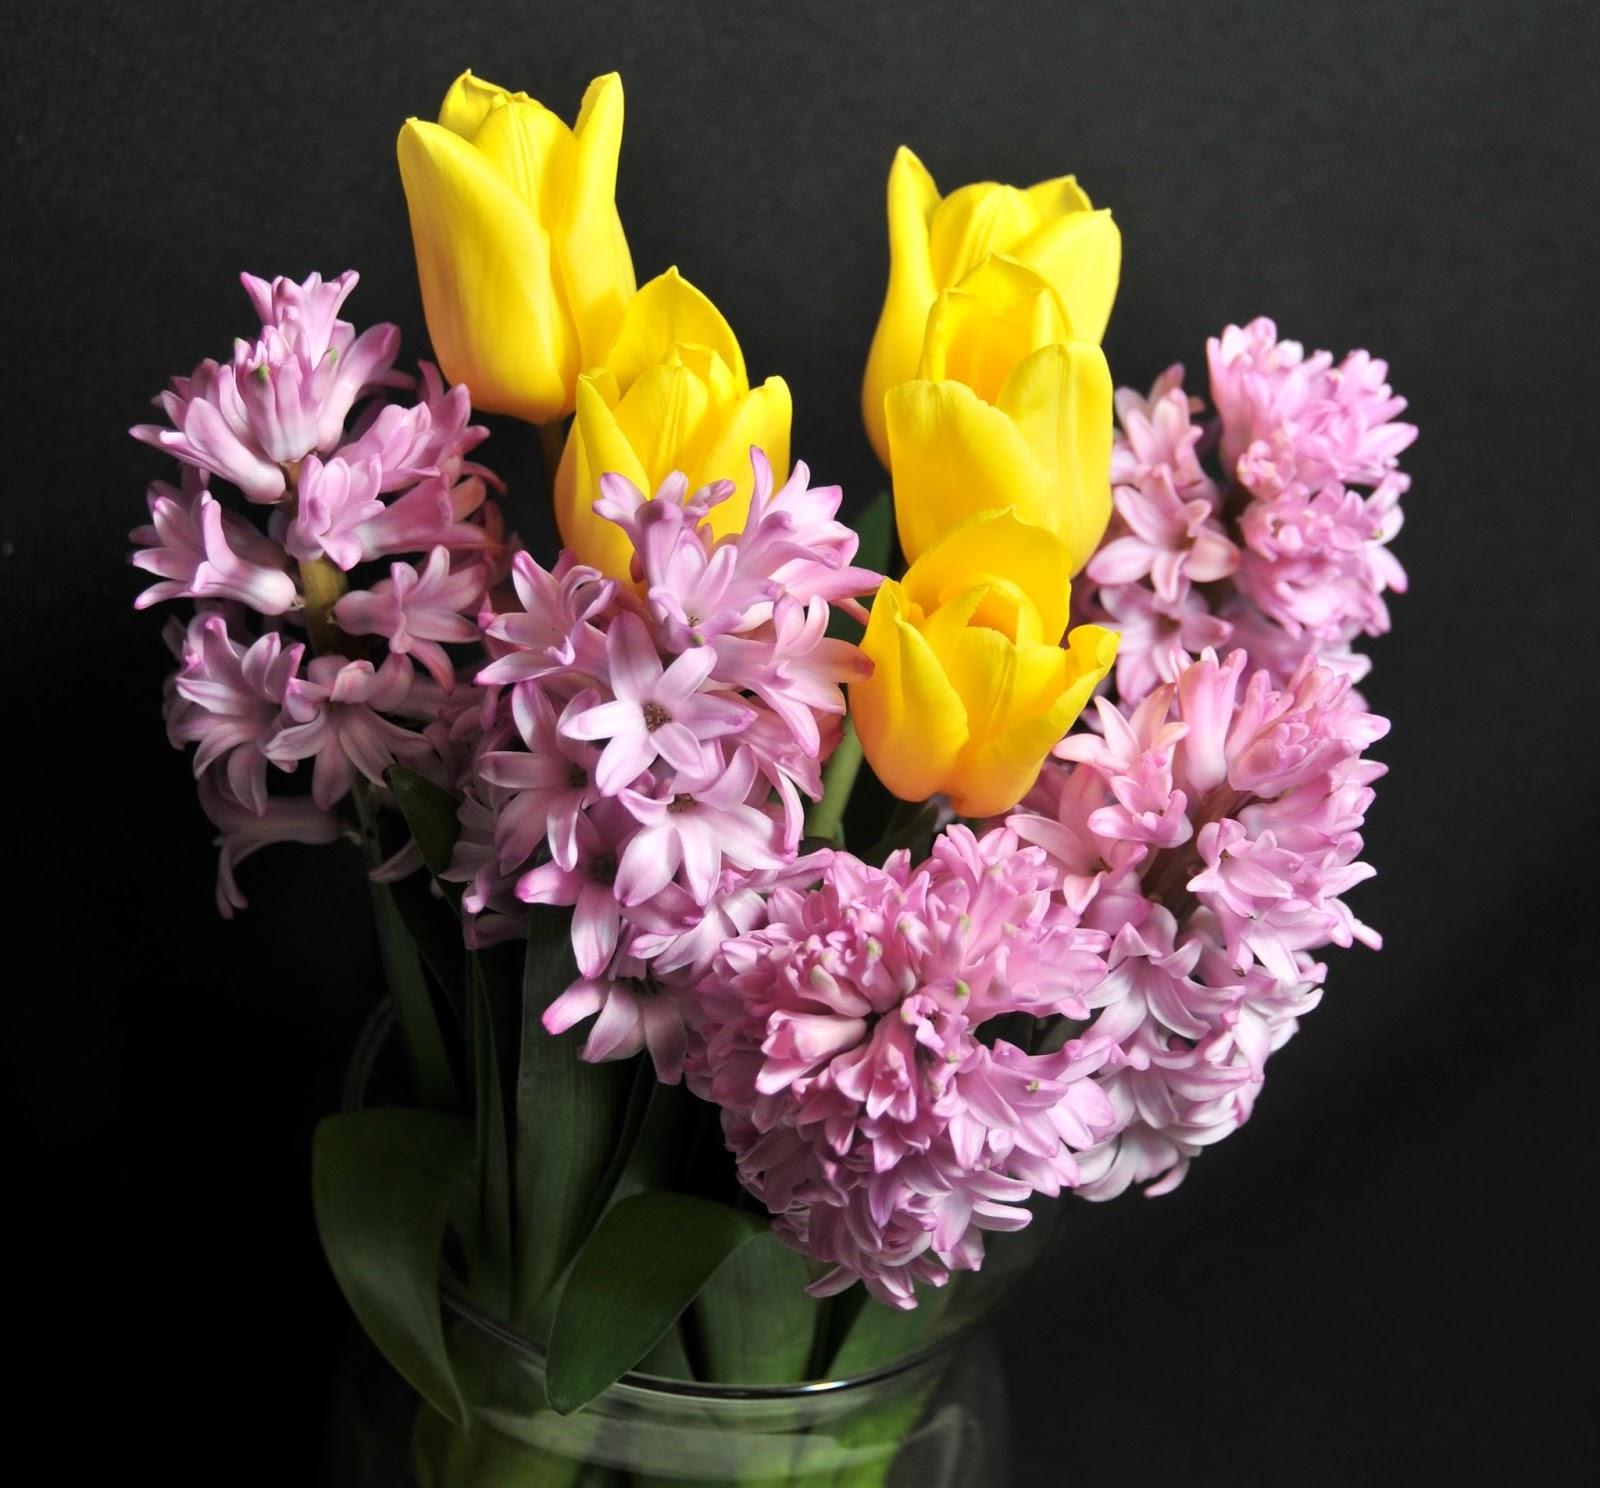 Hyacinth season is here flower talk hyacinth and tulip bouquet izmirmasajfo